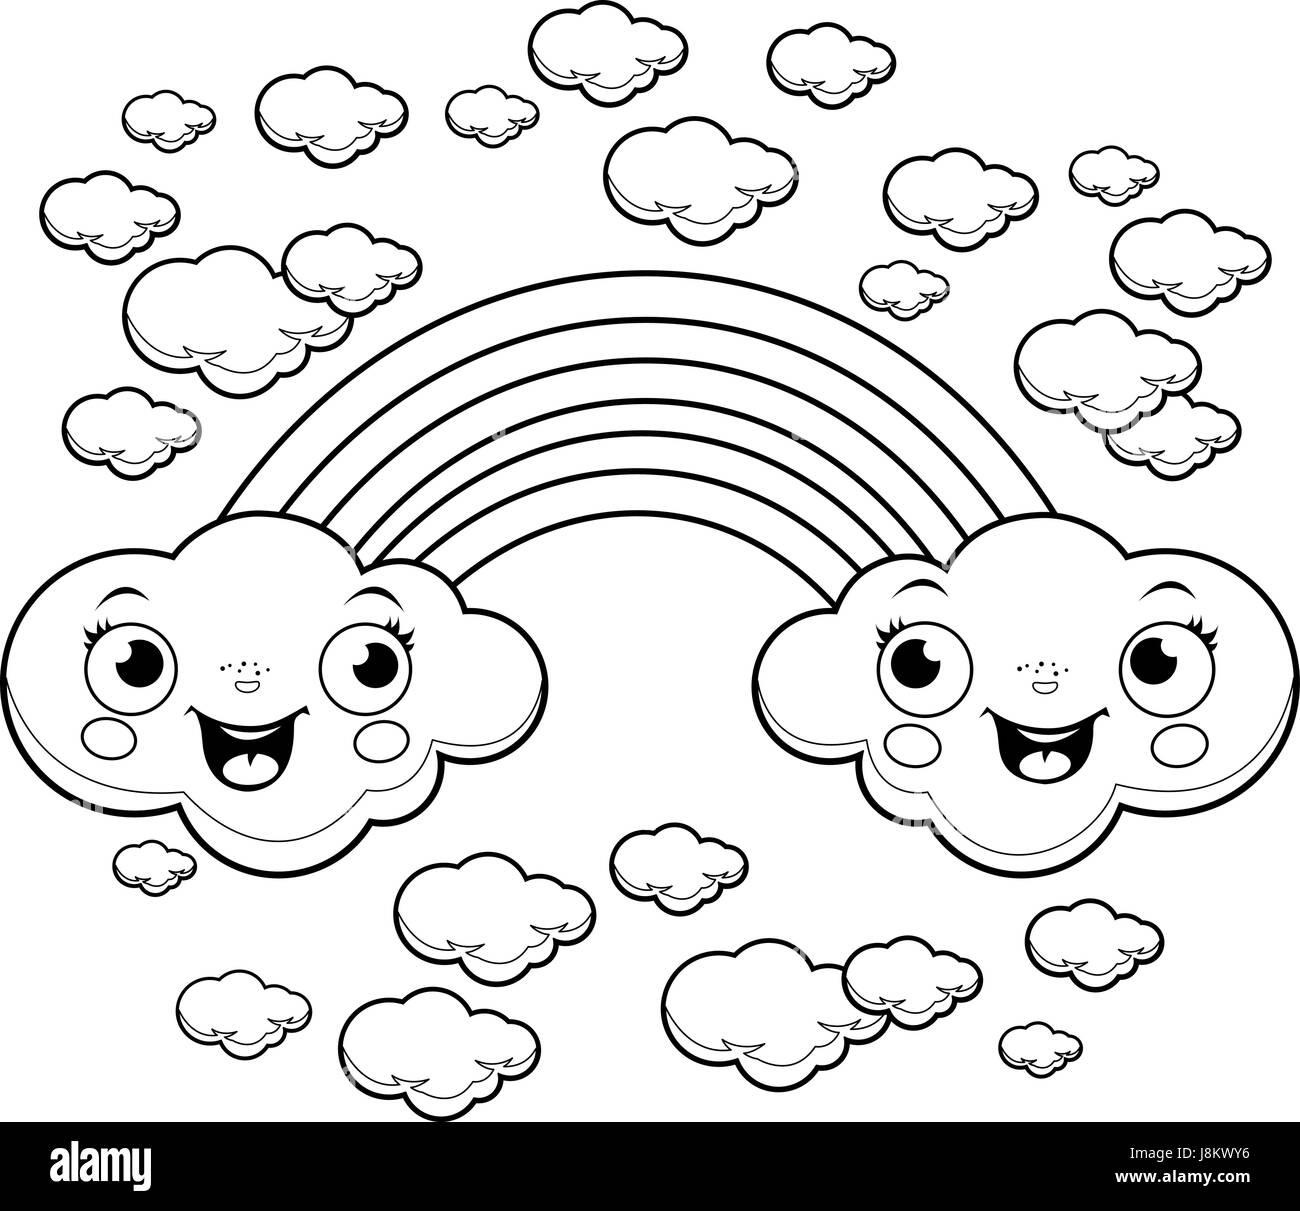 Cloud Line Drawing Stockfotos & Cloud Line Drawing Bilder - Alamy